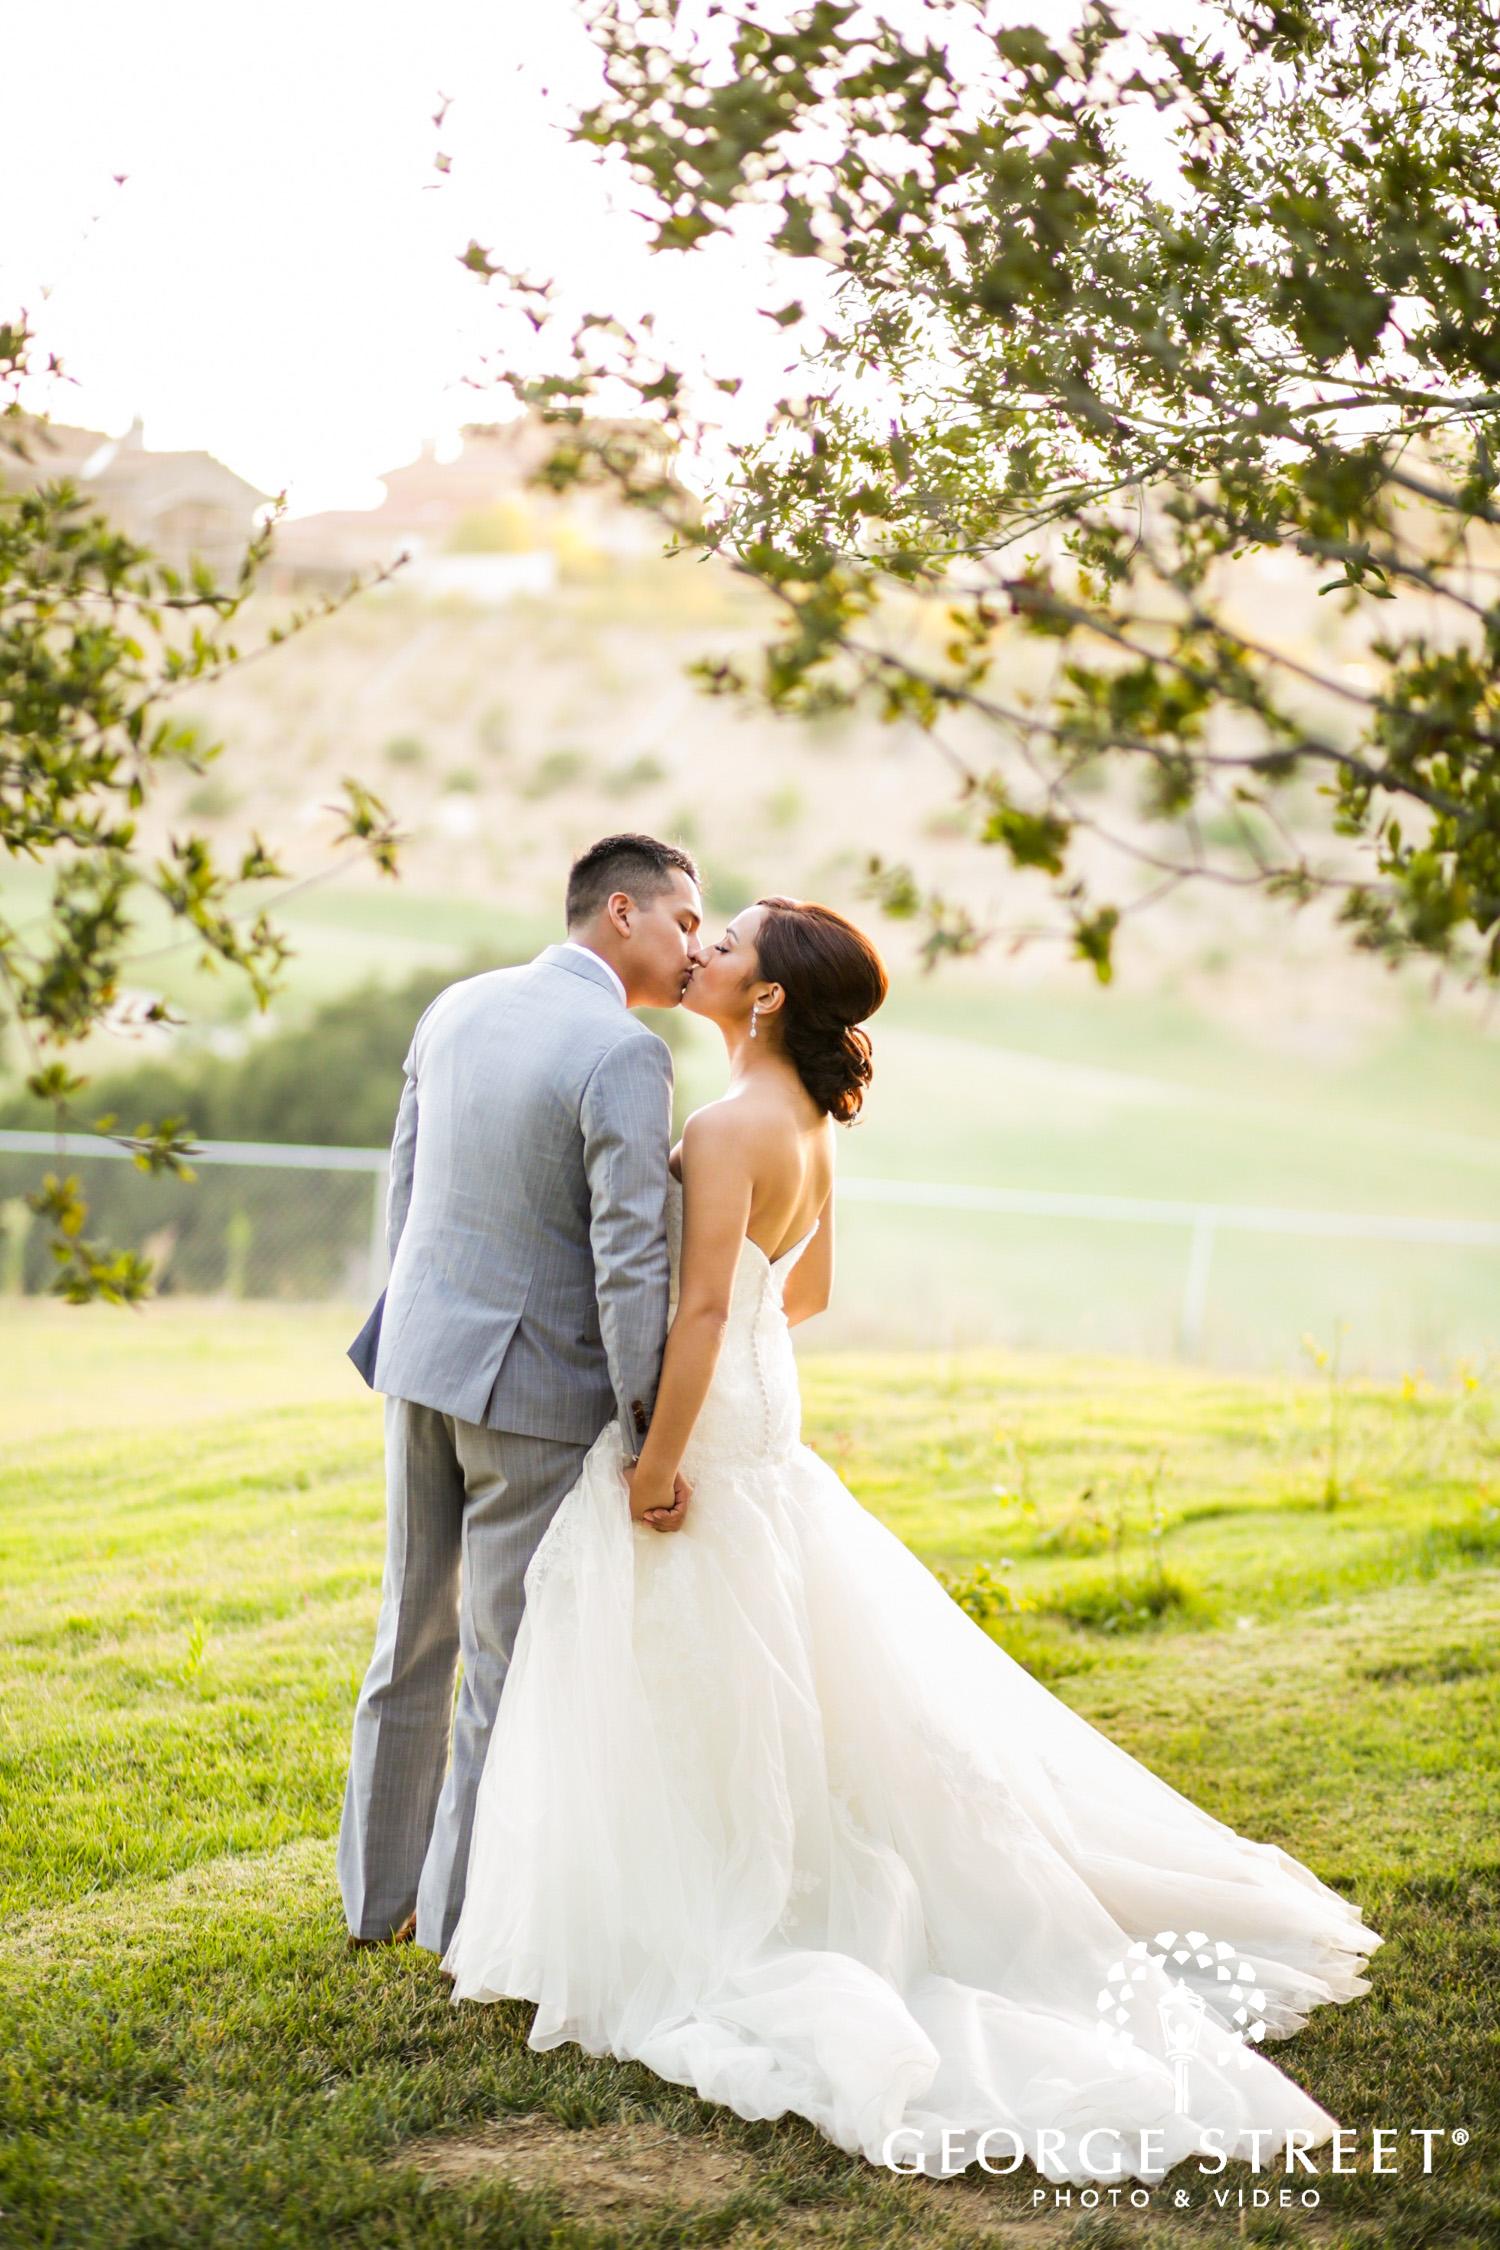 stunning sunset Los Angeles wedding photography